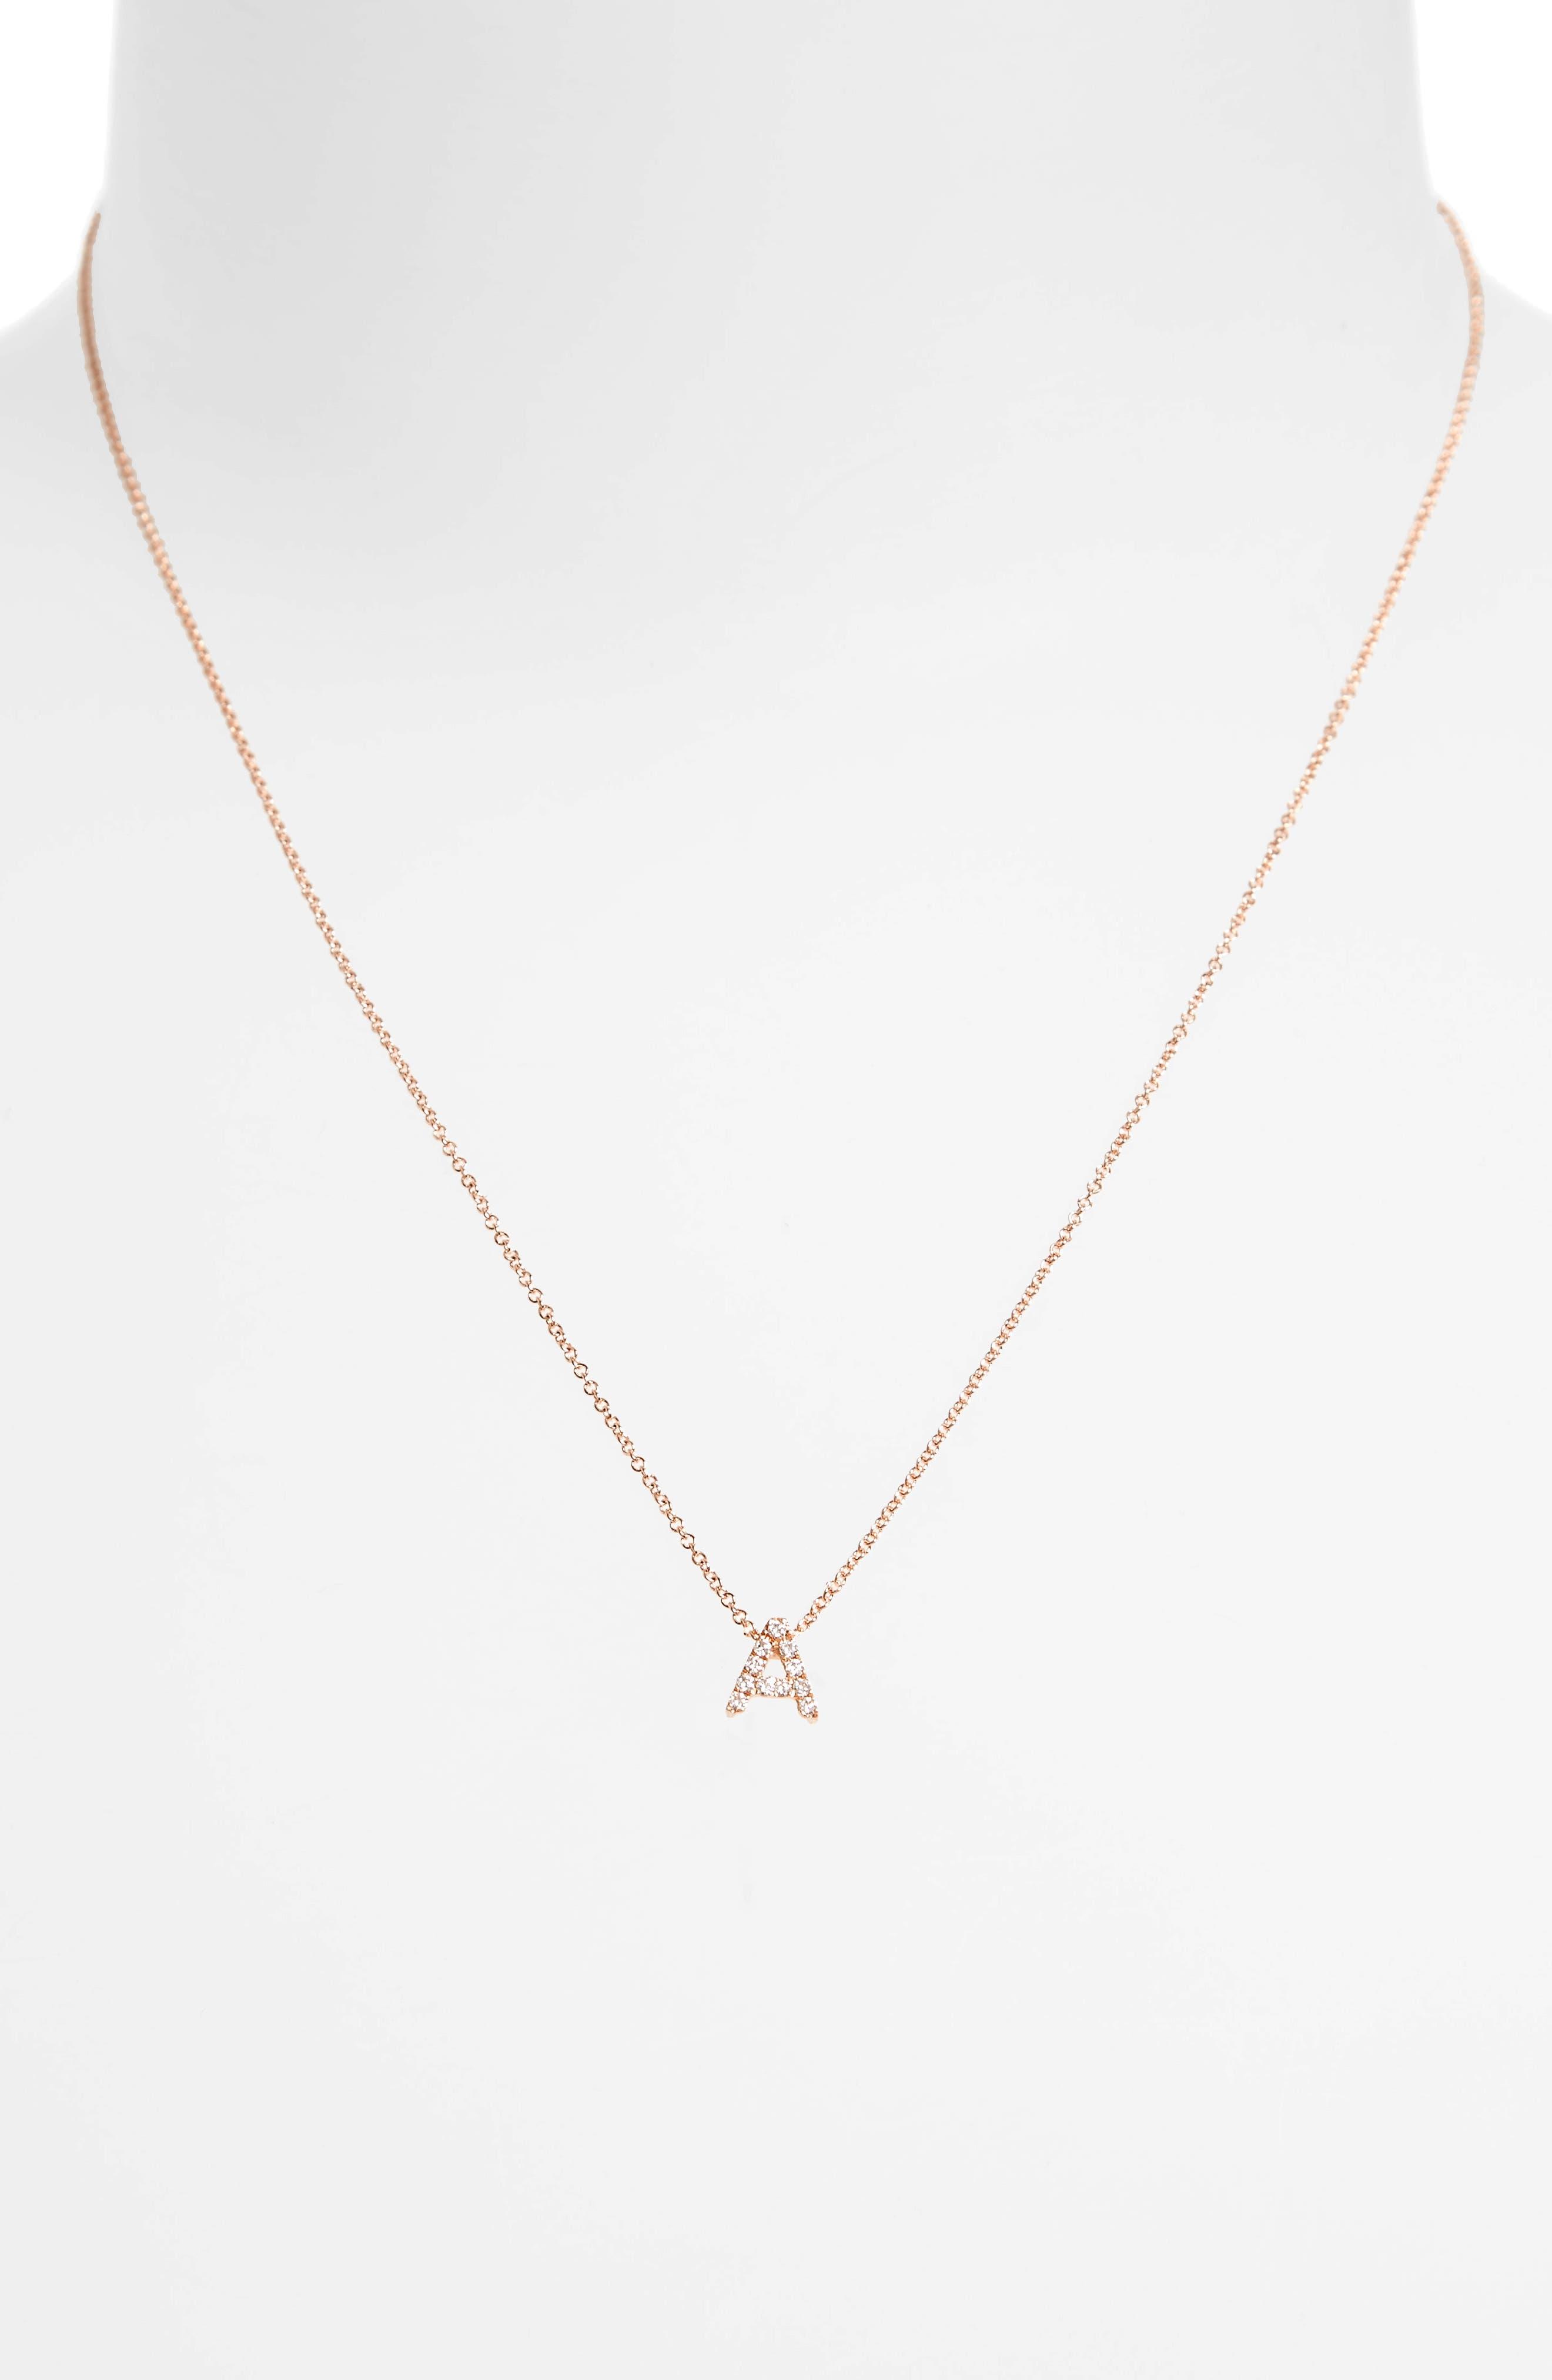 18k Gold Pavé Diamond Initial Pendant Necklace,                             Alternate thumbnail 3, color,                             ROSE GOLD - A